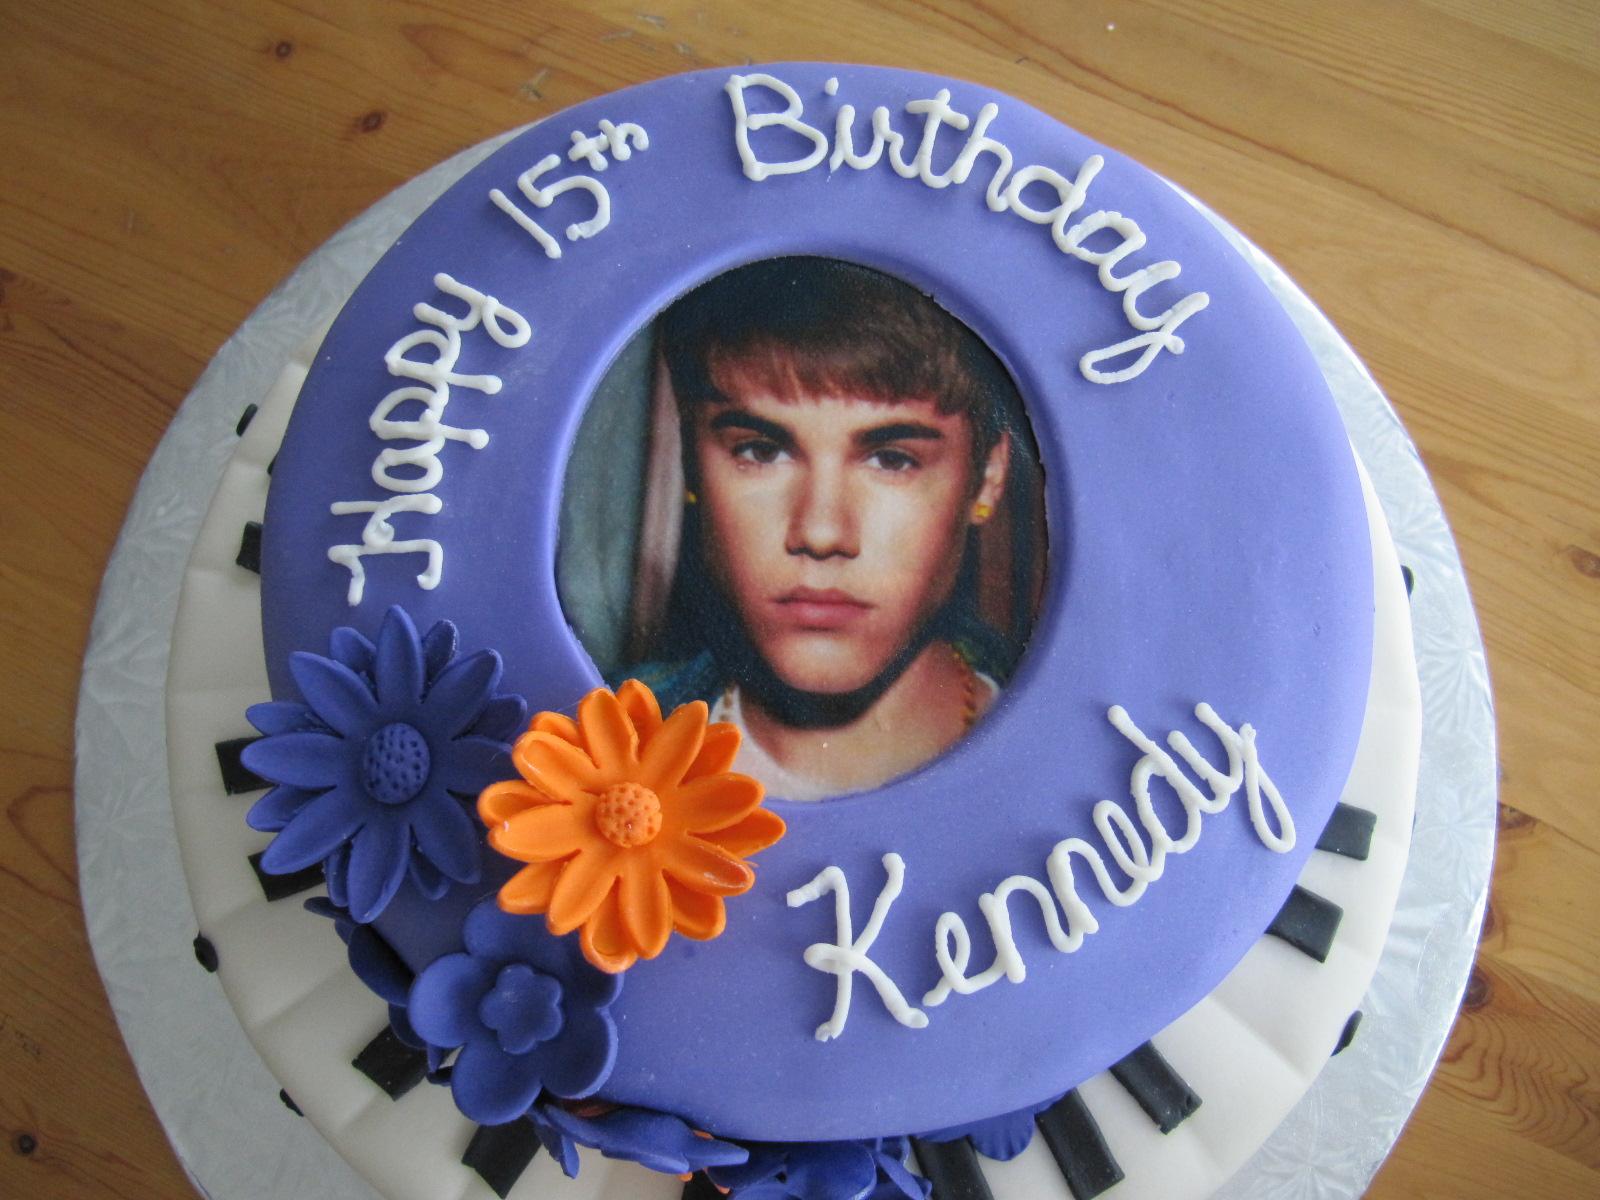 Remarkable Justin Bieber Birthday Cake Ericas Edibles Funny Birthday Cards Online Elaedamsfinfo